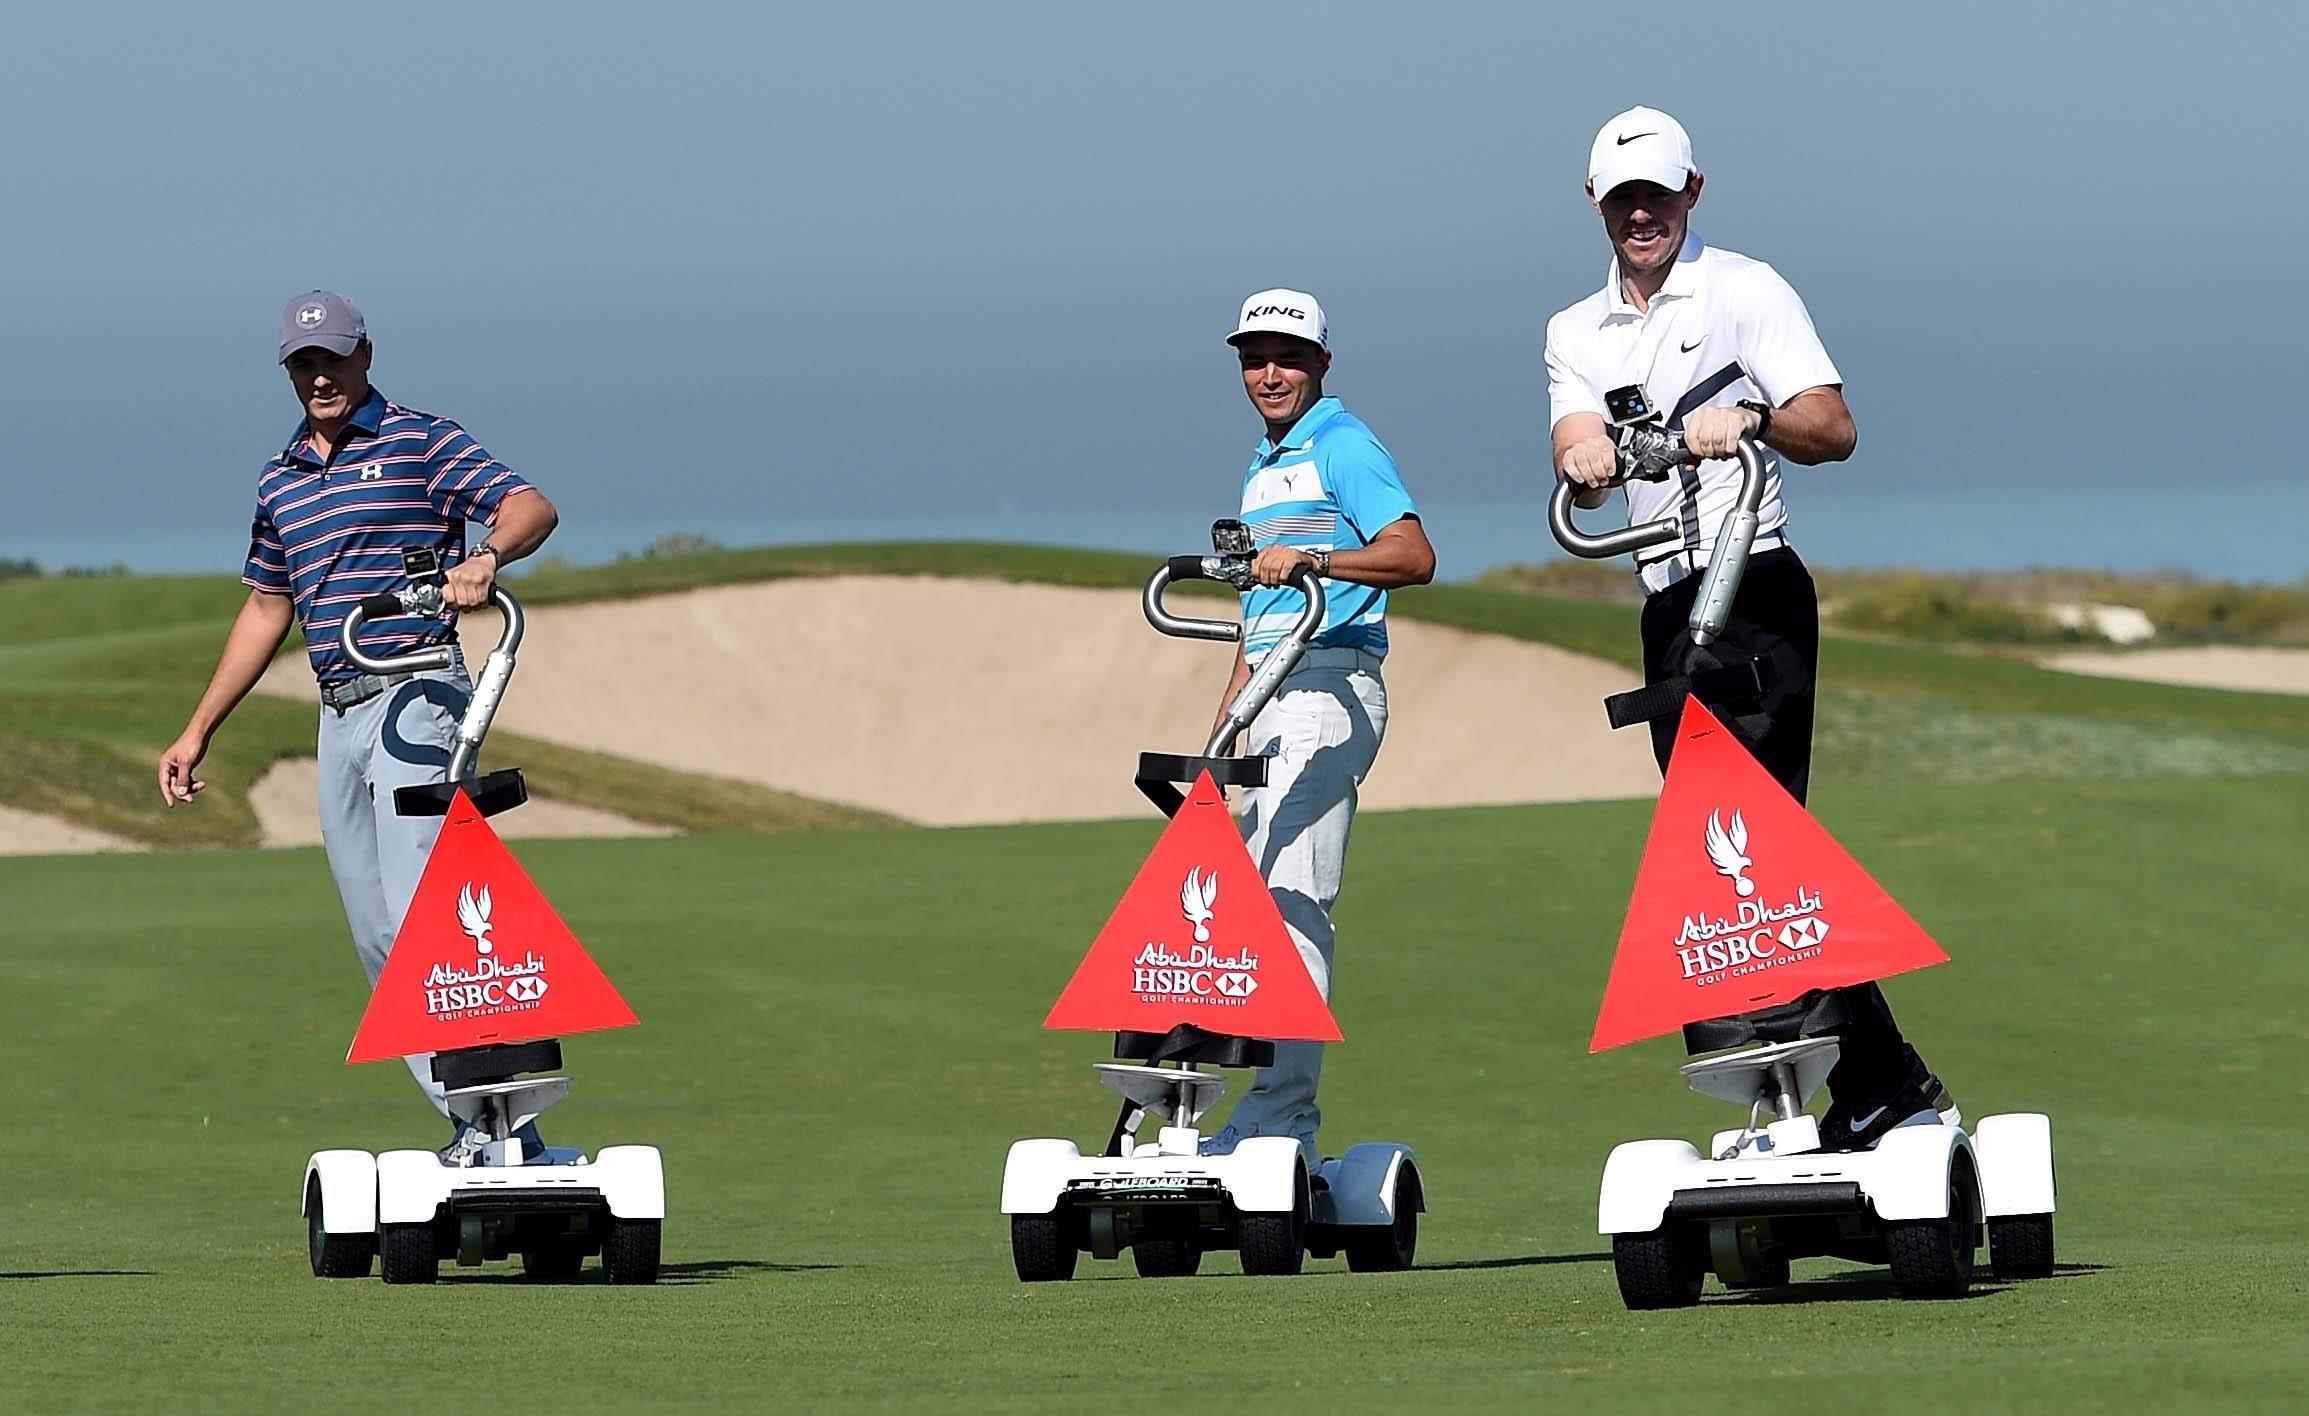 Jordan Spieth, Rickie Fowler and Rory McIlroy